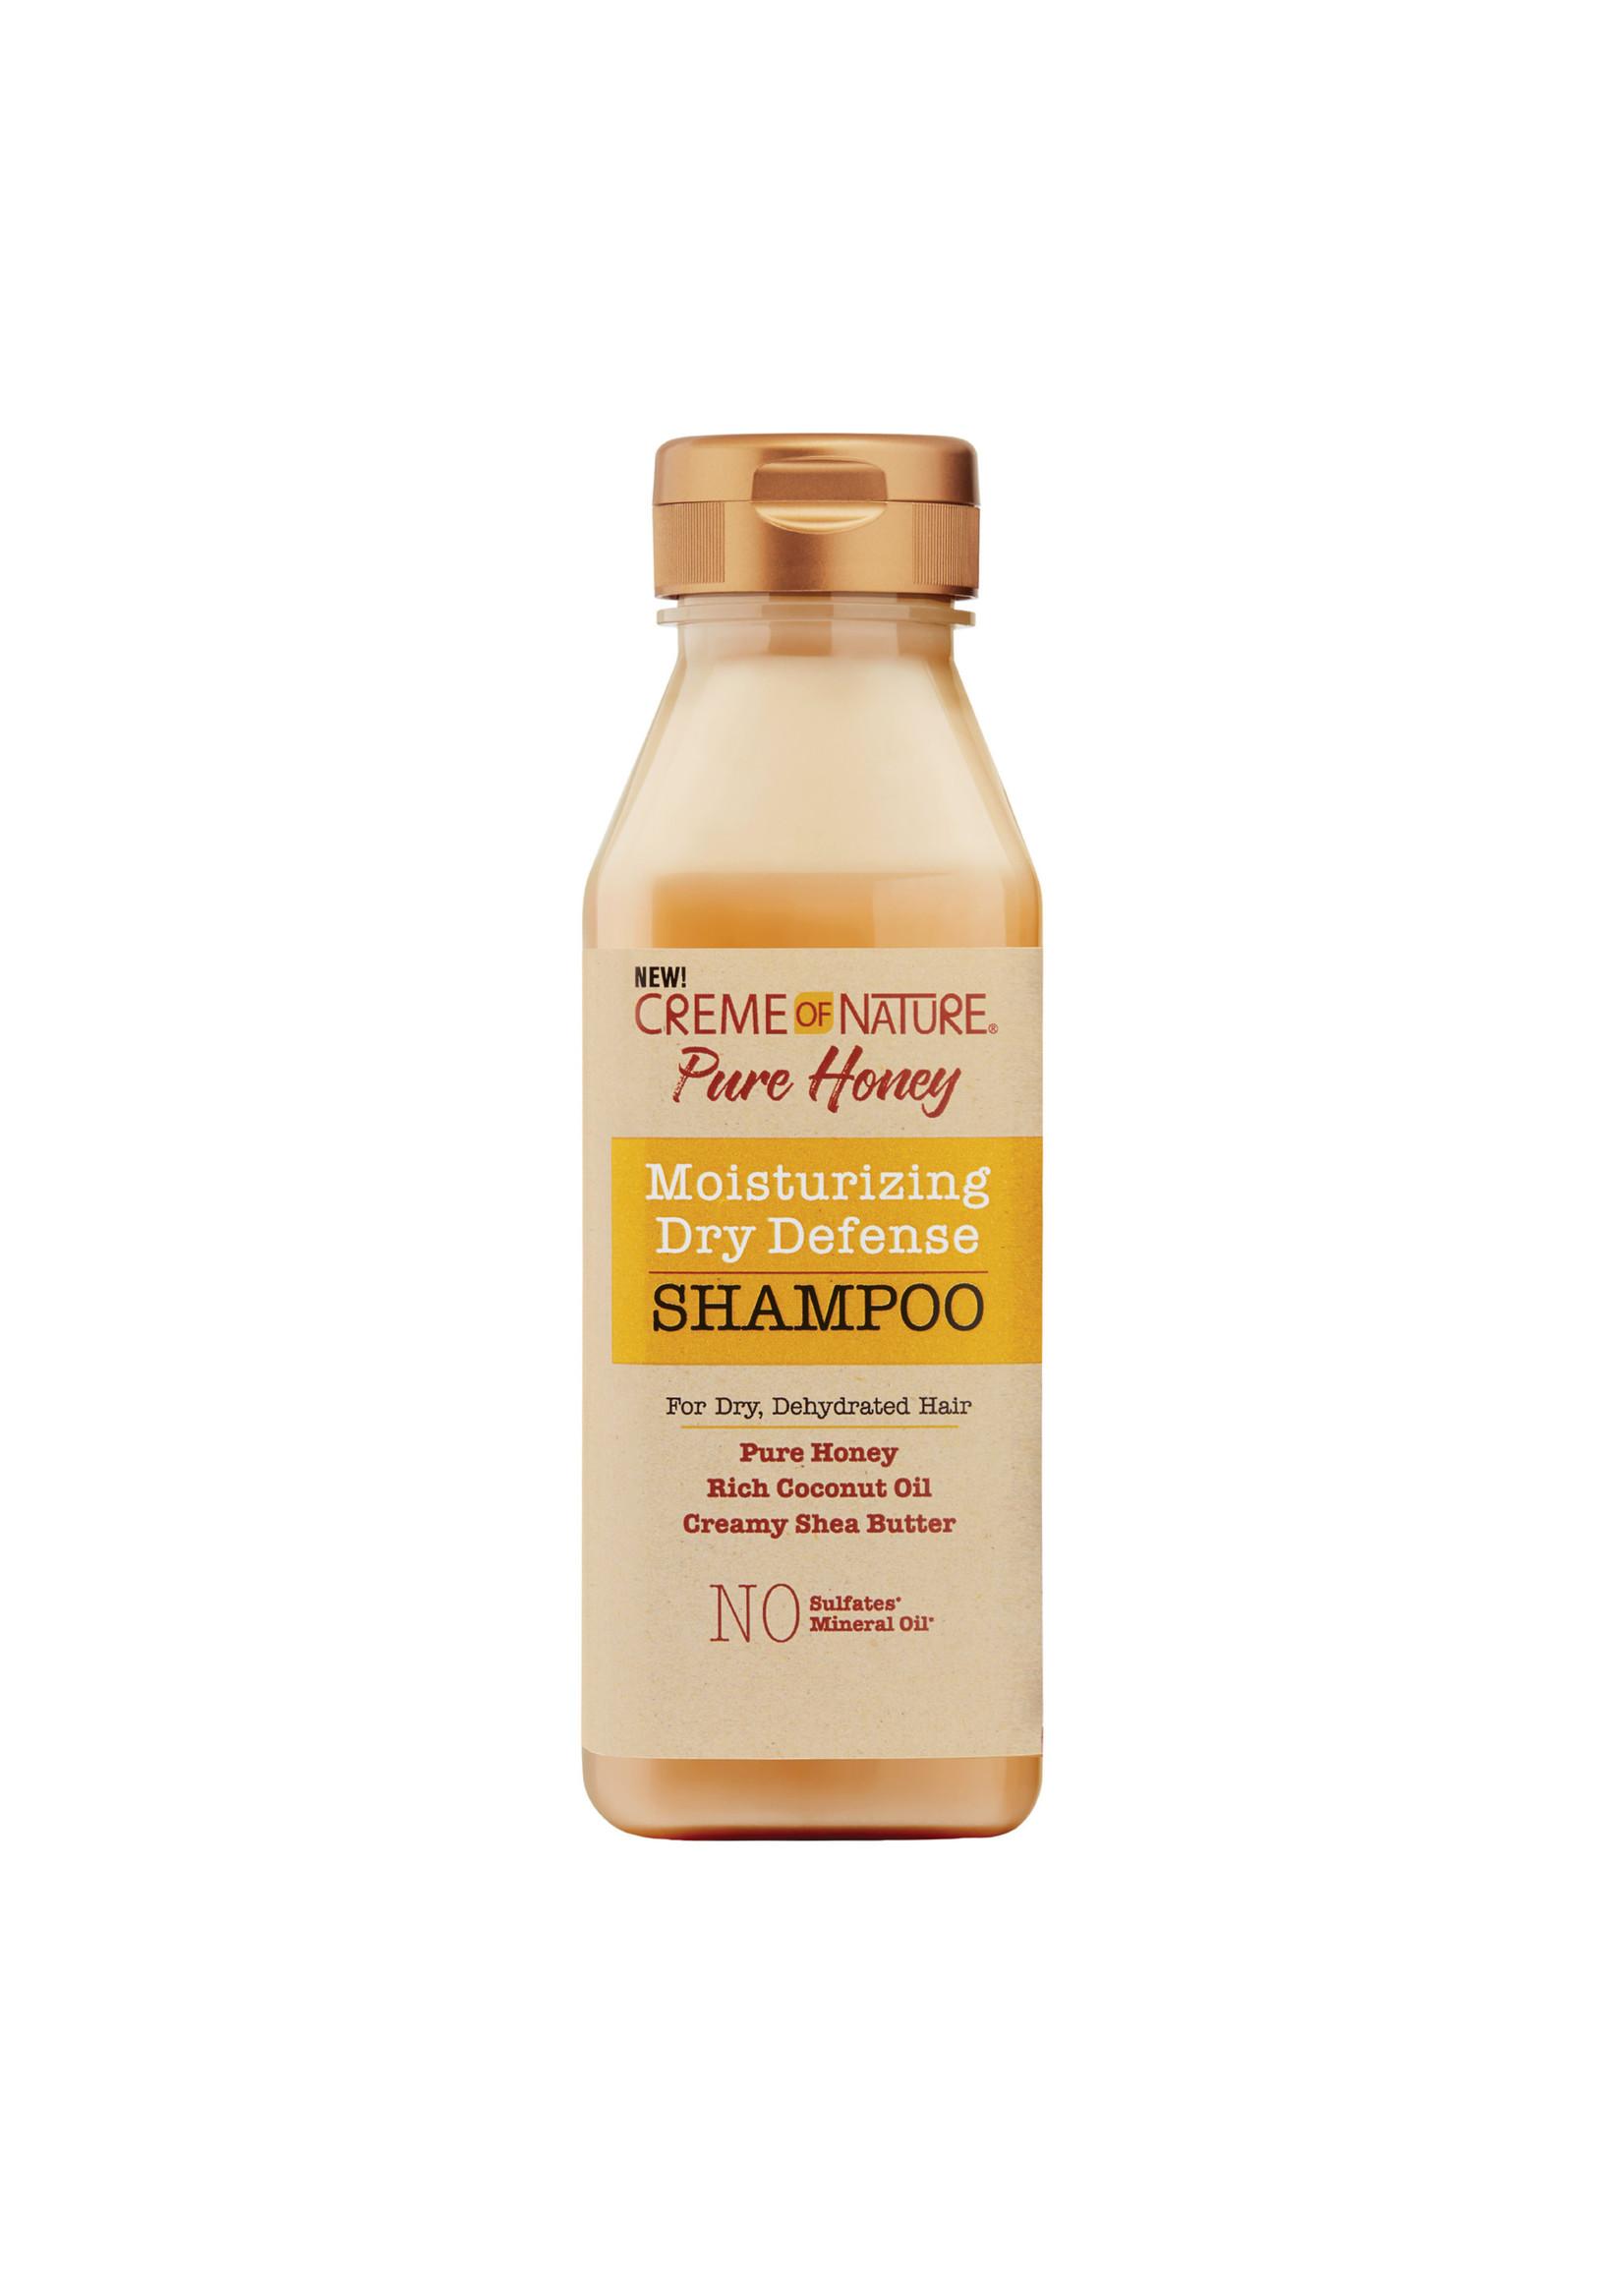 Creme of Nature Pure Honey Shampoo 12oz